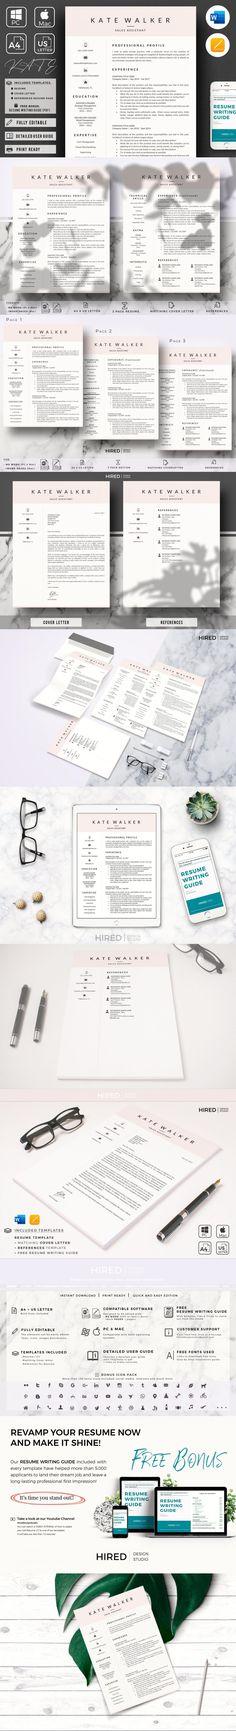 Sales Resume + Cover Letter Template #ResumeHelp #saleresumetemplate #ResumeDesign #3pageresume #retailresumesales #patterns #salesresume #creativecv #CV #StationeryTemplates #ResumeTemplateDesign #ResumeWriting #minimalistcv #pat #cleanresume #ResumeFormat #BestResumeFormat #pattern Resume Cover Letter Template, Cover Letter Format, Cv Template, Print Templates, Stationery Printing, Stationery Templates, Stationery Design, Resume Templates, Cv Design